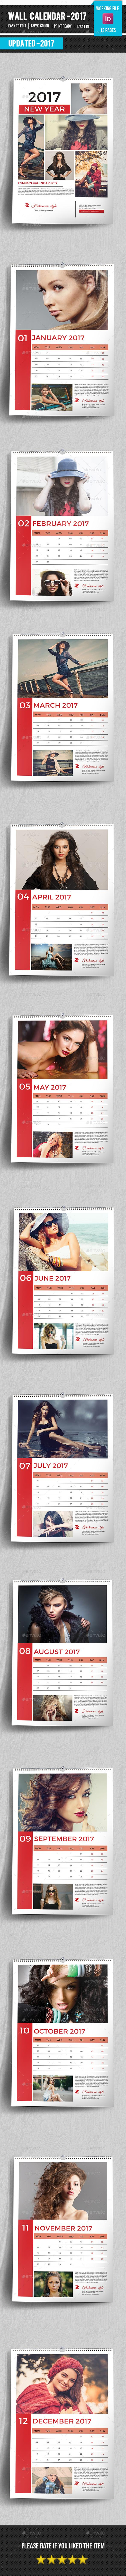 Wall Calendar Template 2017-V11 - Calendars Stationery